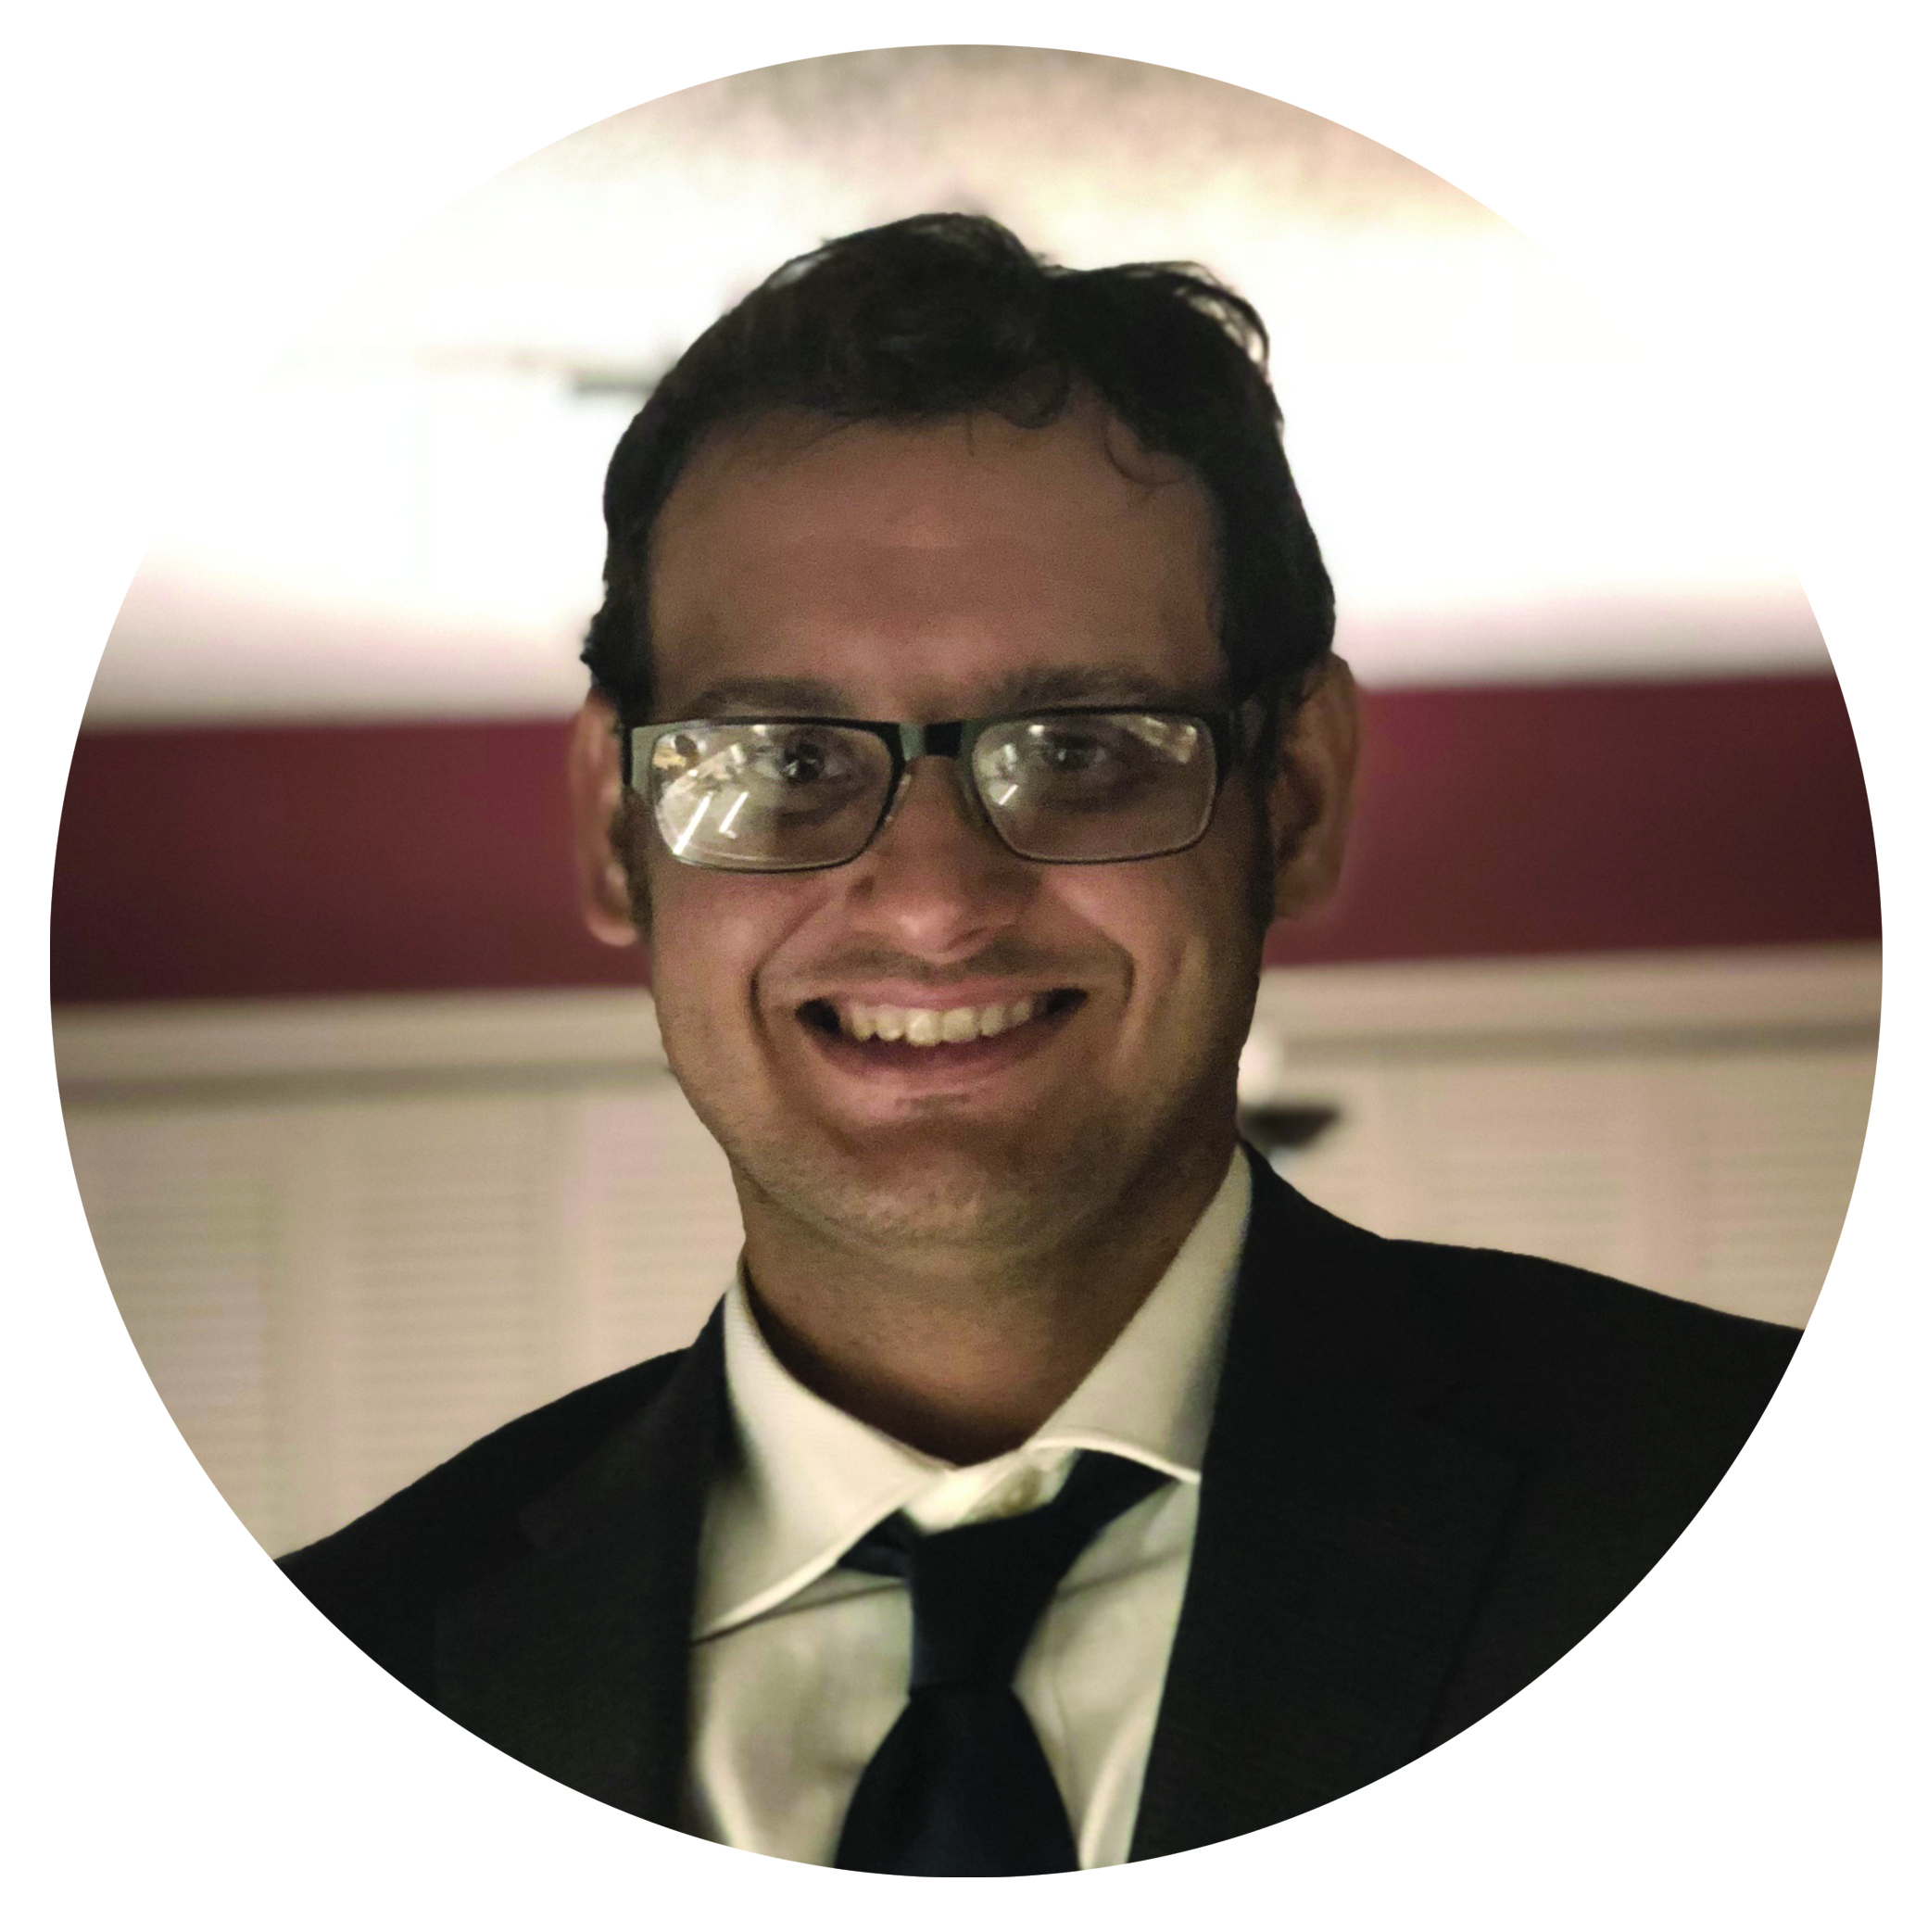 Jordan Ledford, M.S. - 8+ years Profiles experience, data glutton, assessment expert.